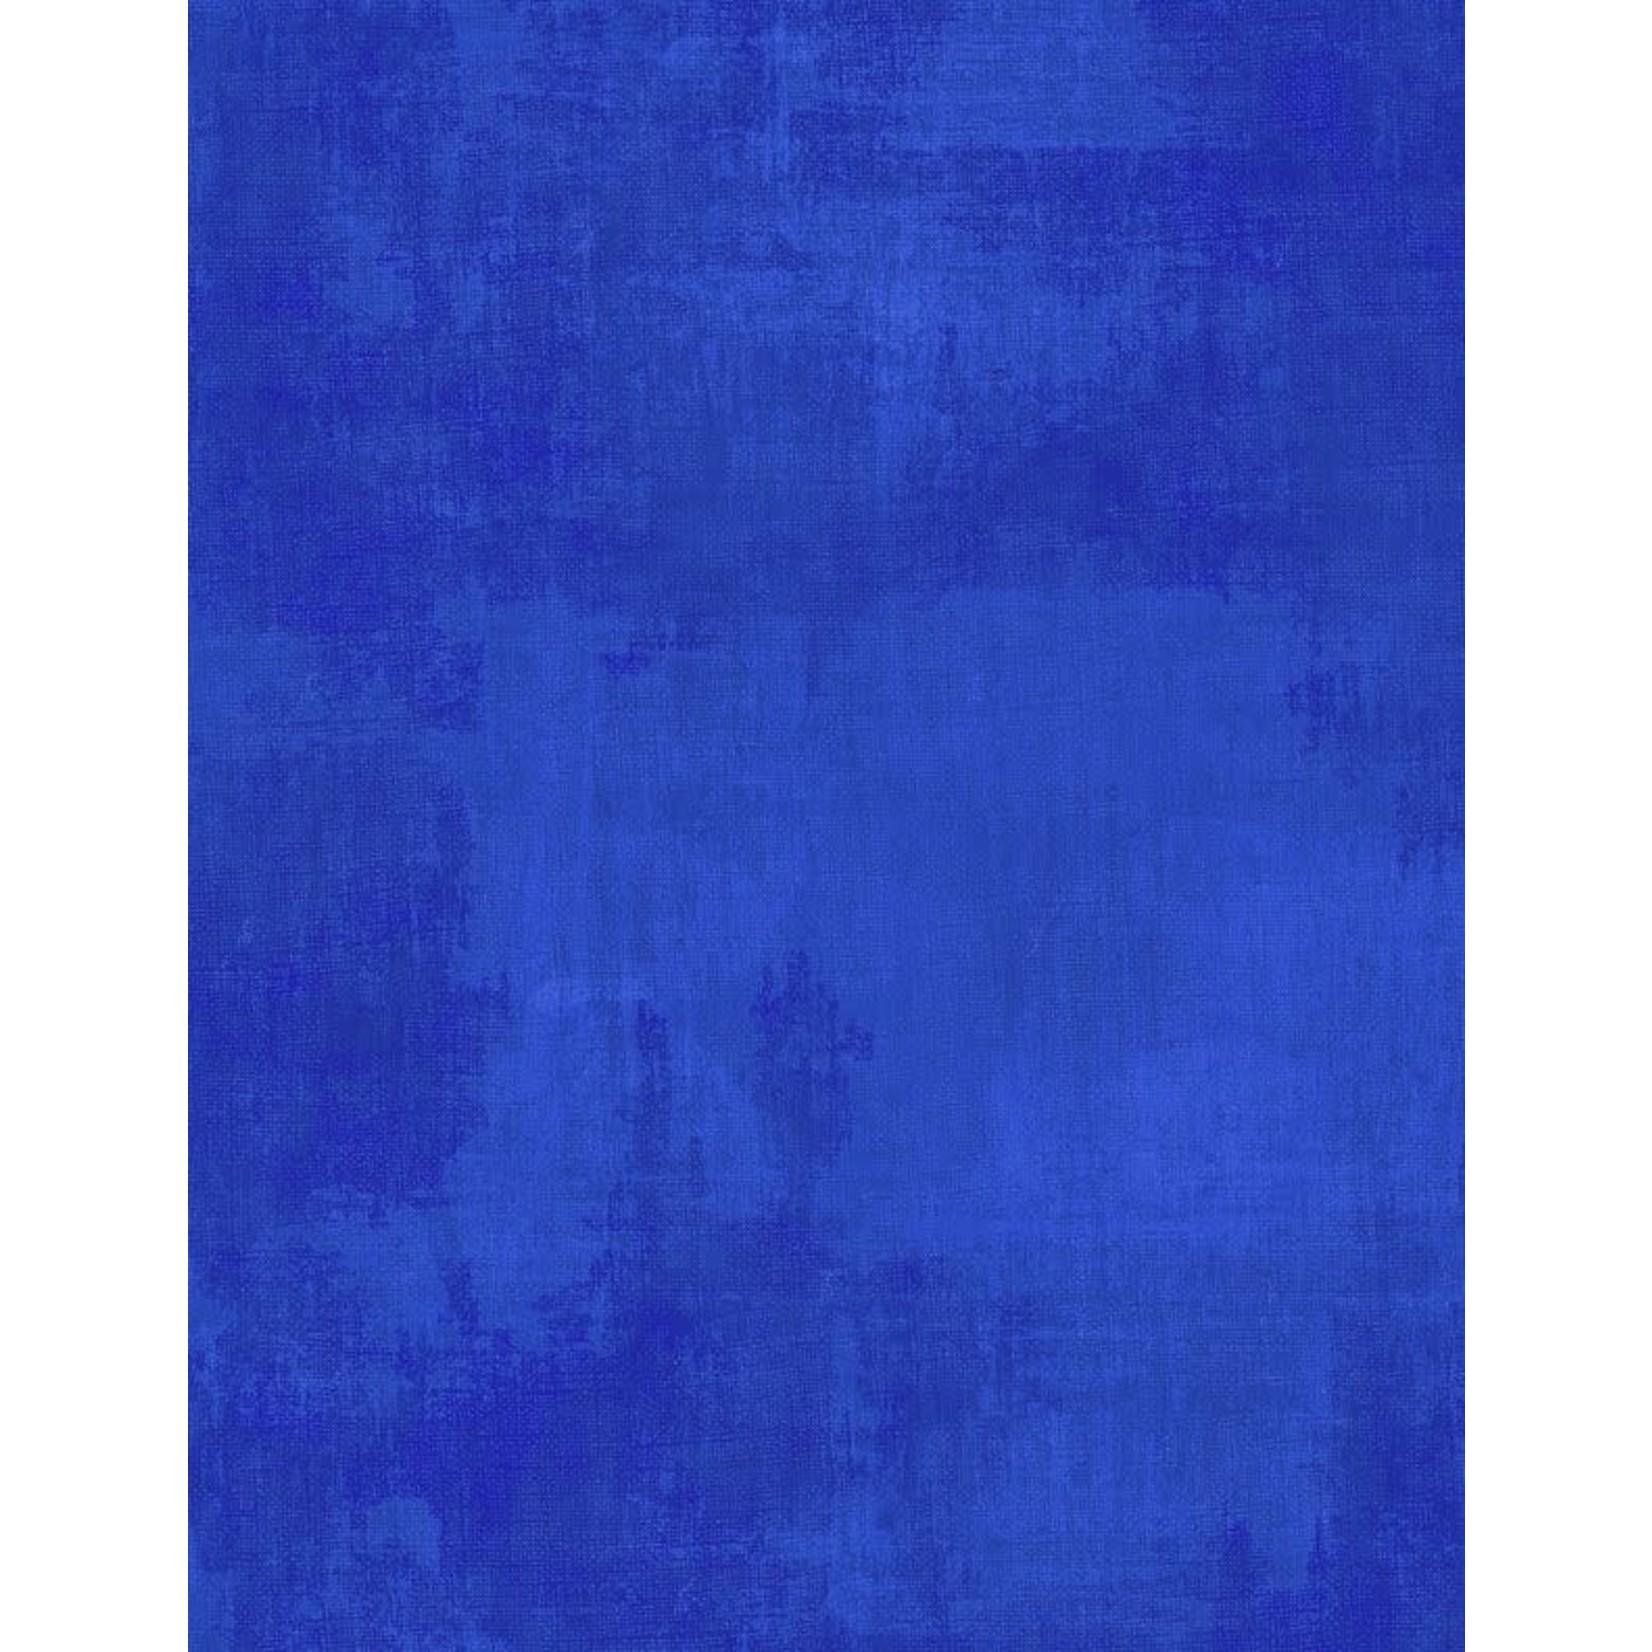 WILMINGTON PRINTS PER CM OR $20/M ESSENTIALS DRY BRUSH 440 ROYAL BLUE